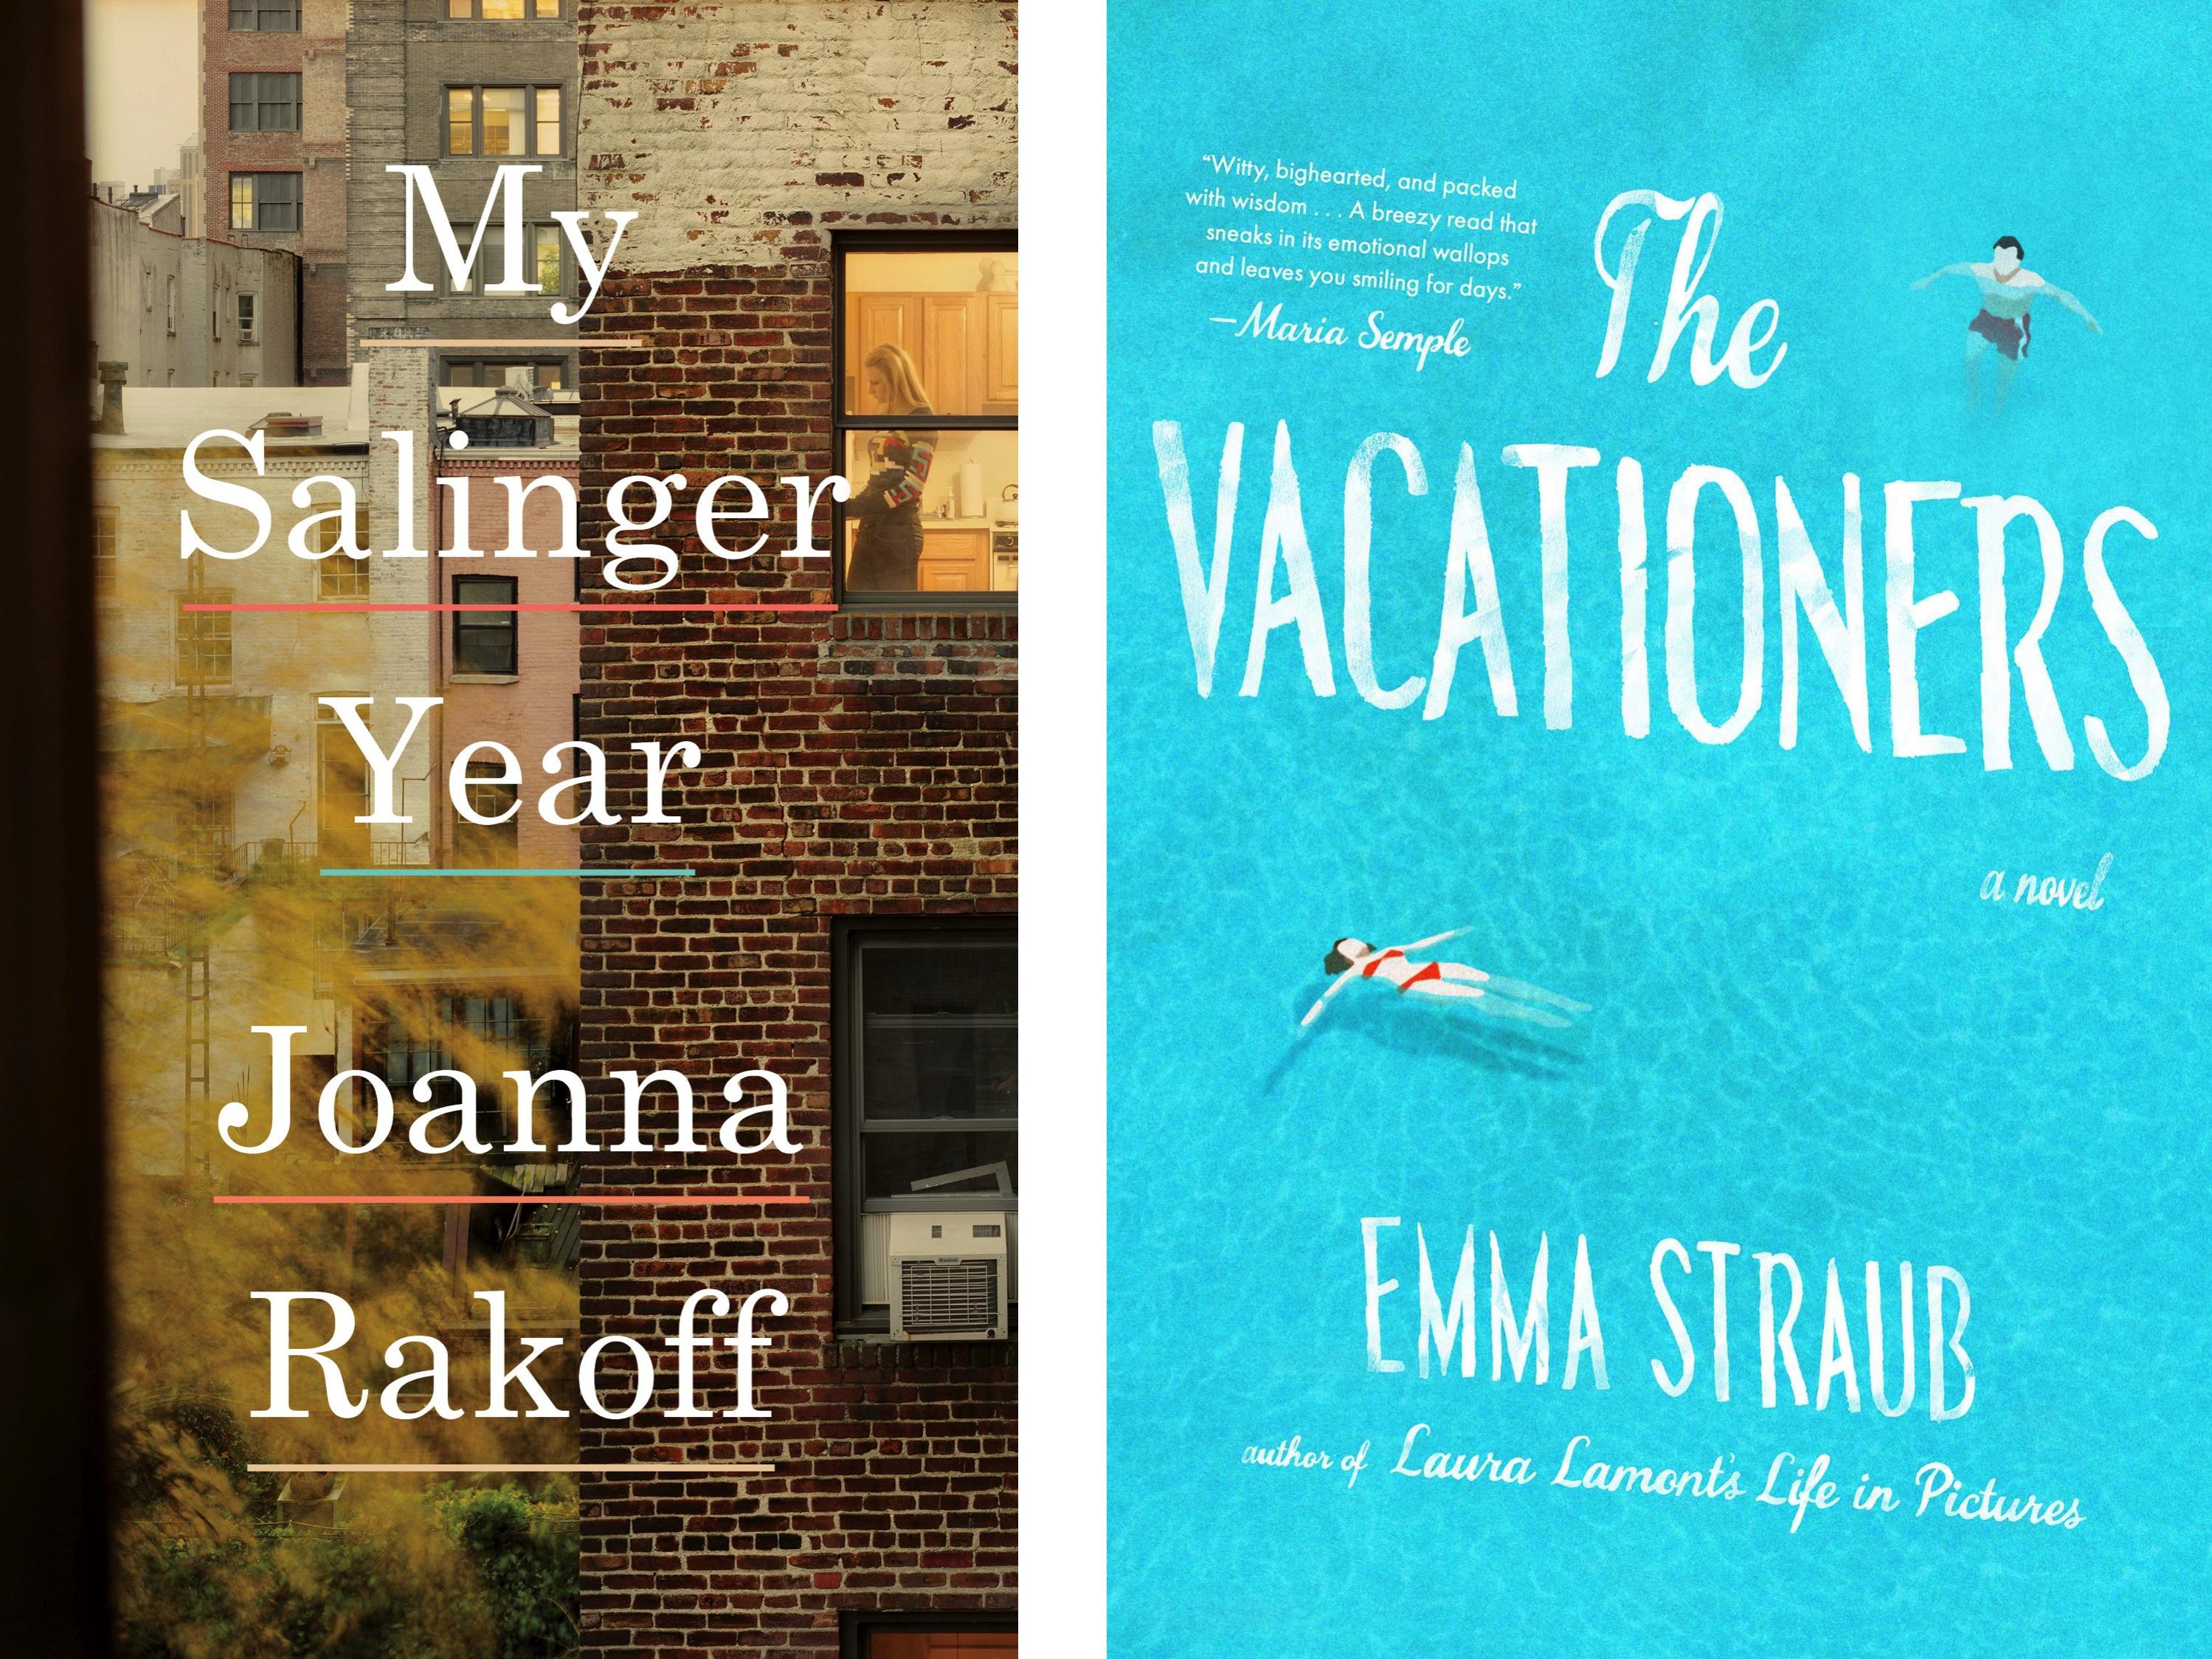 Books Beneath the Bridge, featuring Joanna Rakoff & Emma Straub